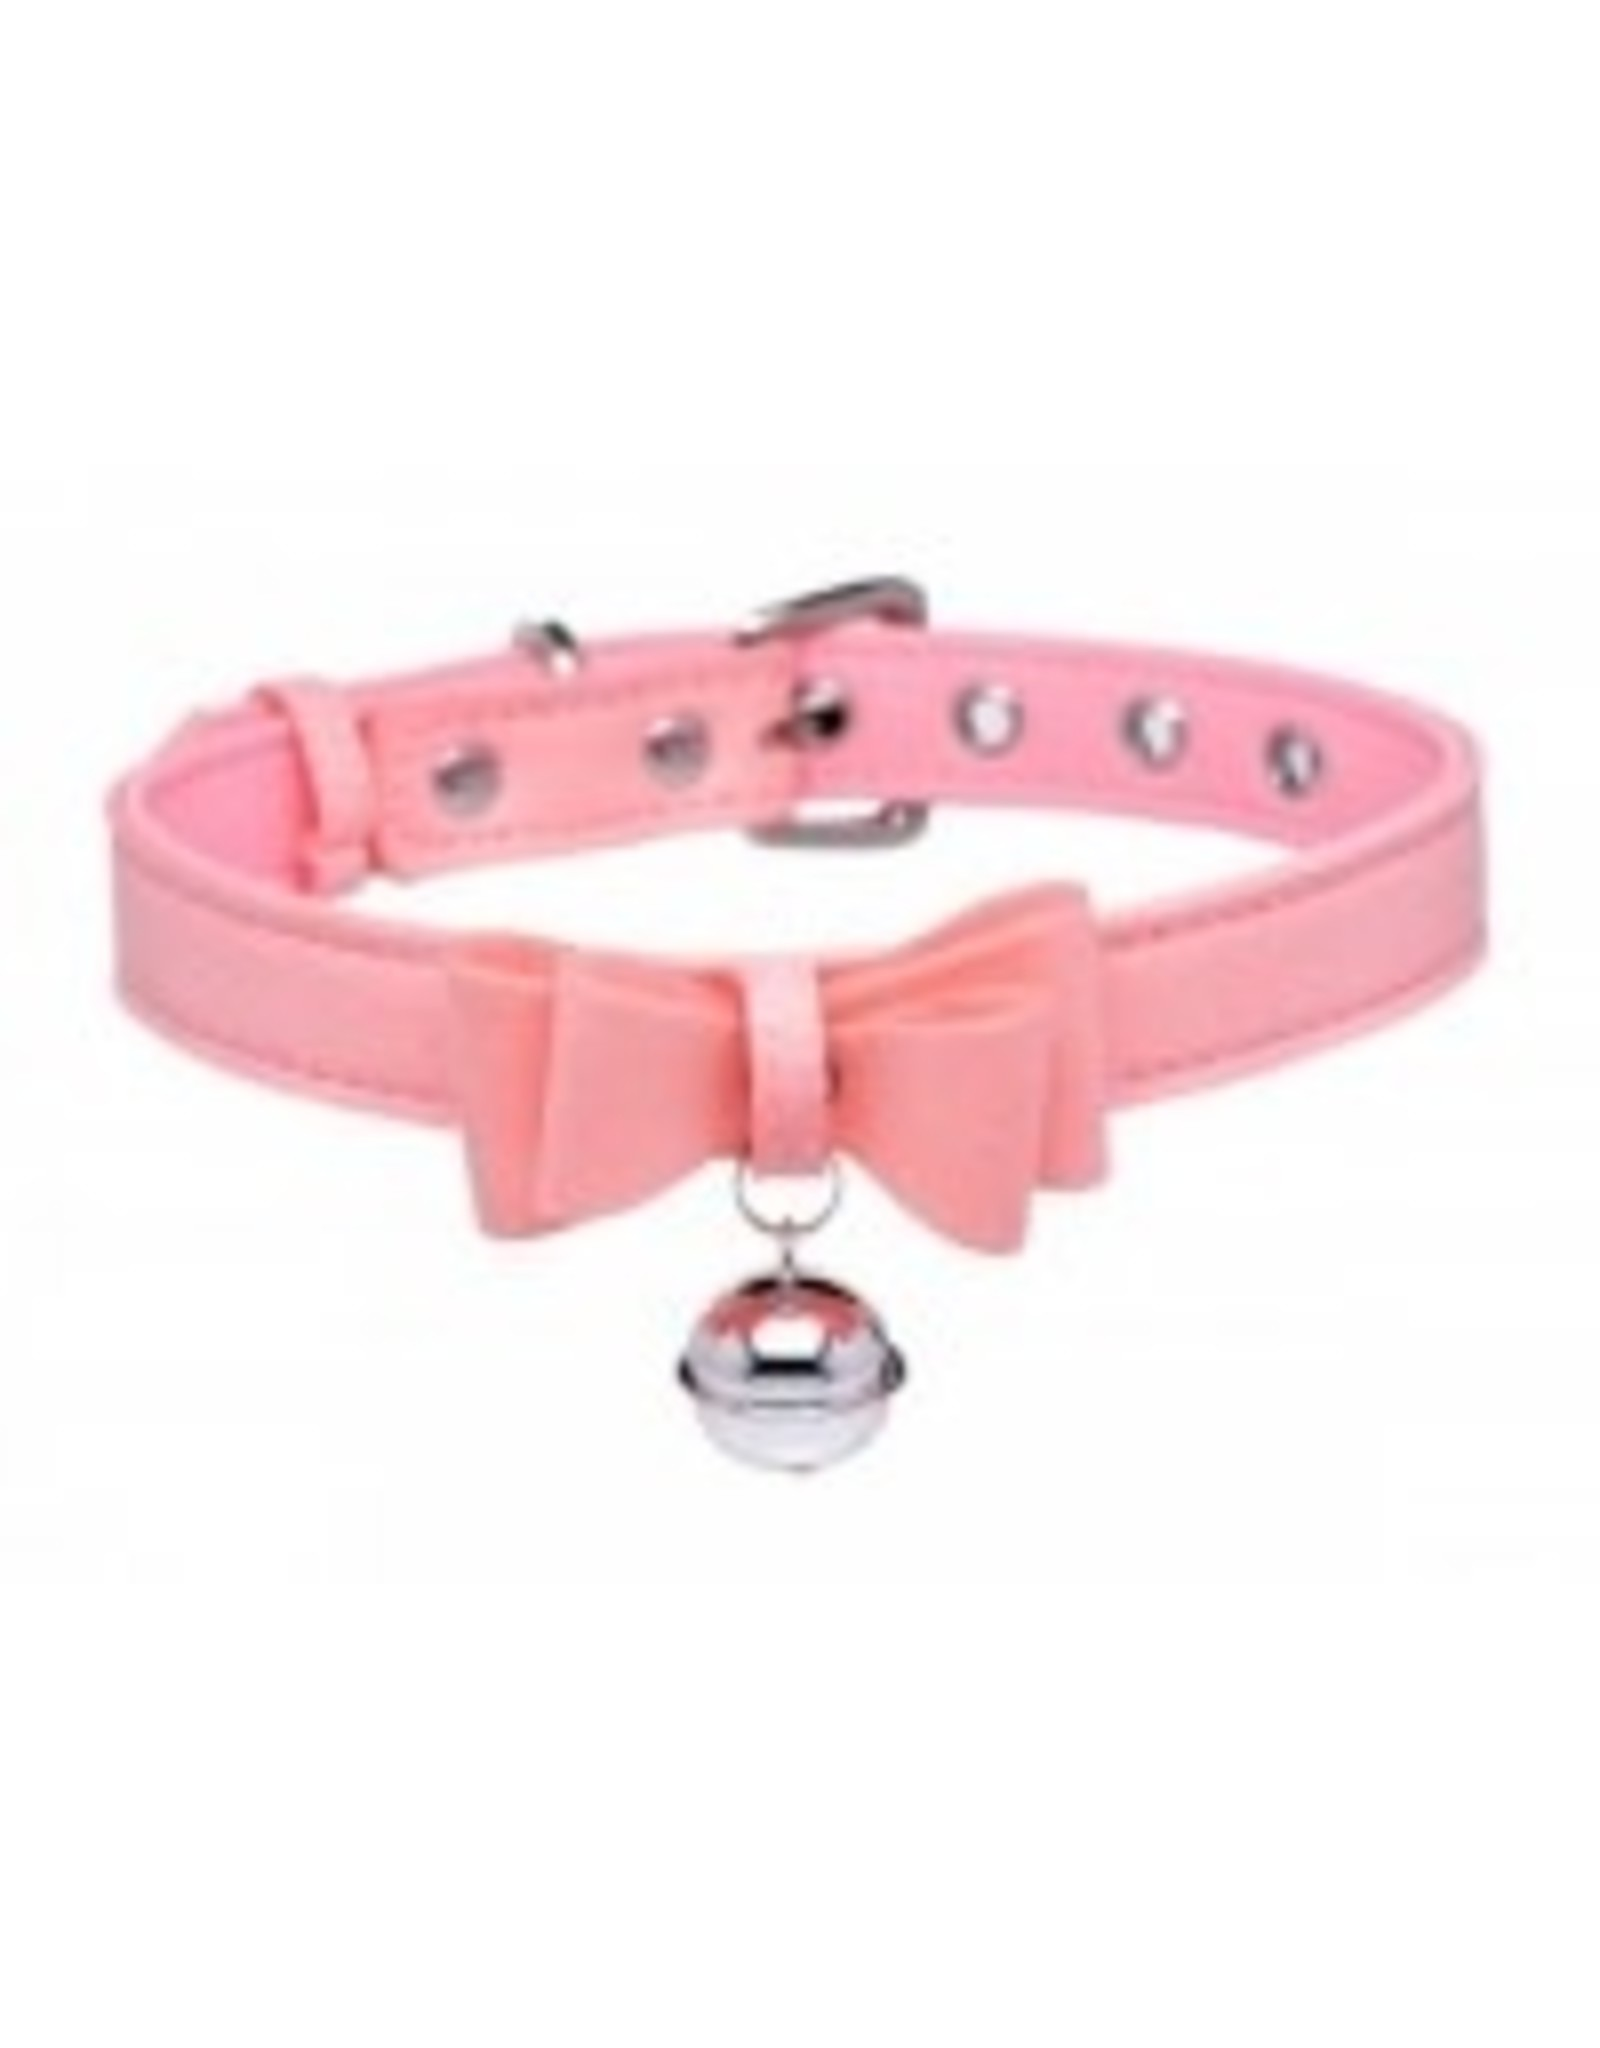 Master Series -  Kitty Collar Bell Collar - Pink